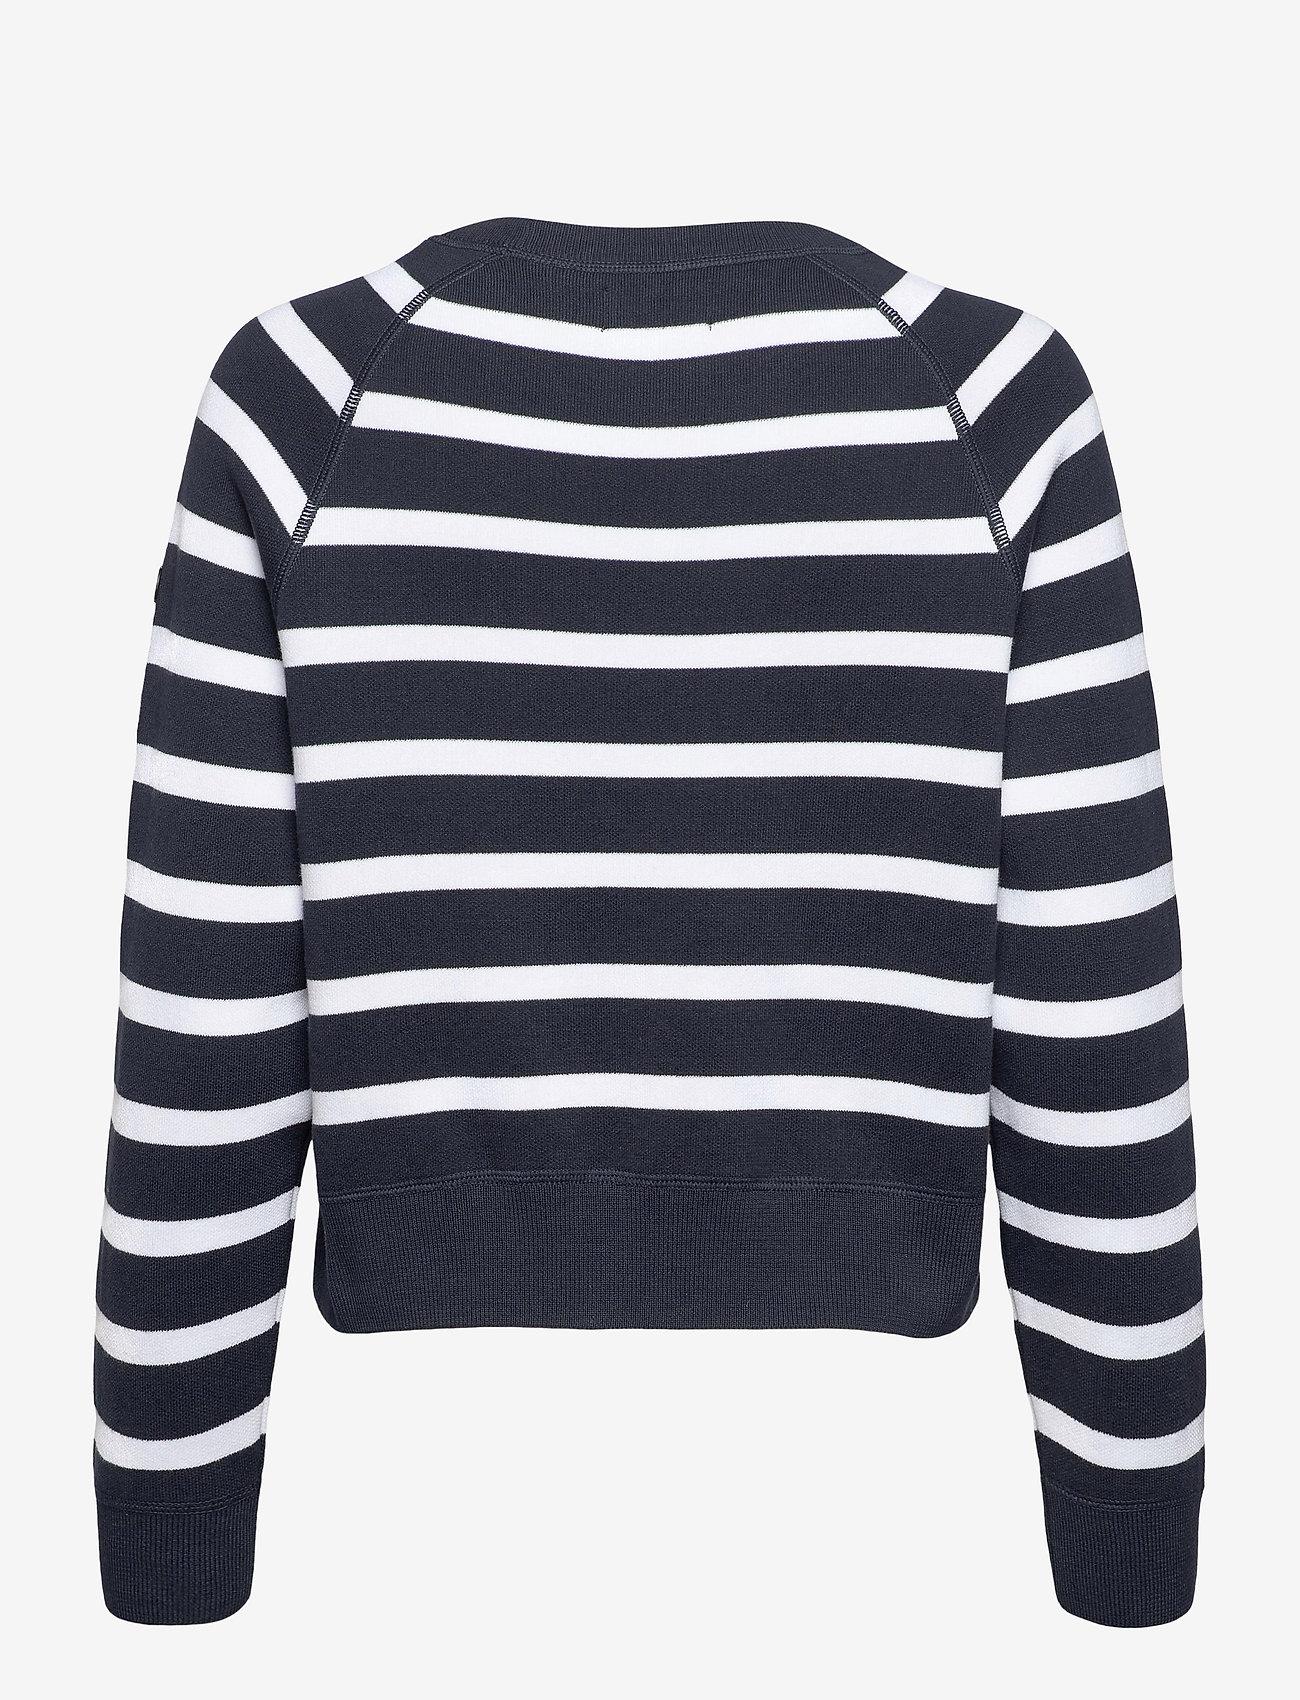 Superdry - ESSENTIAL COTTON CREW - sweaters - eclipse navy stripe - 1